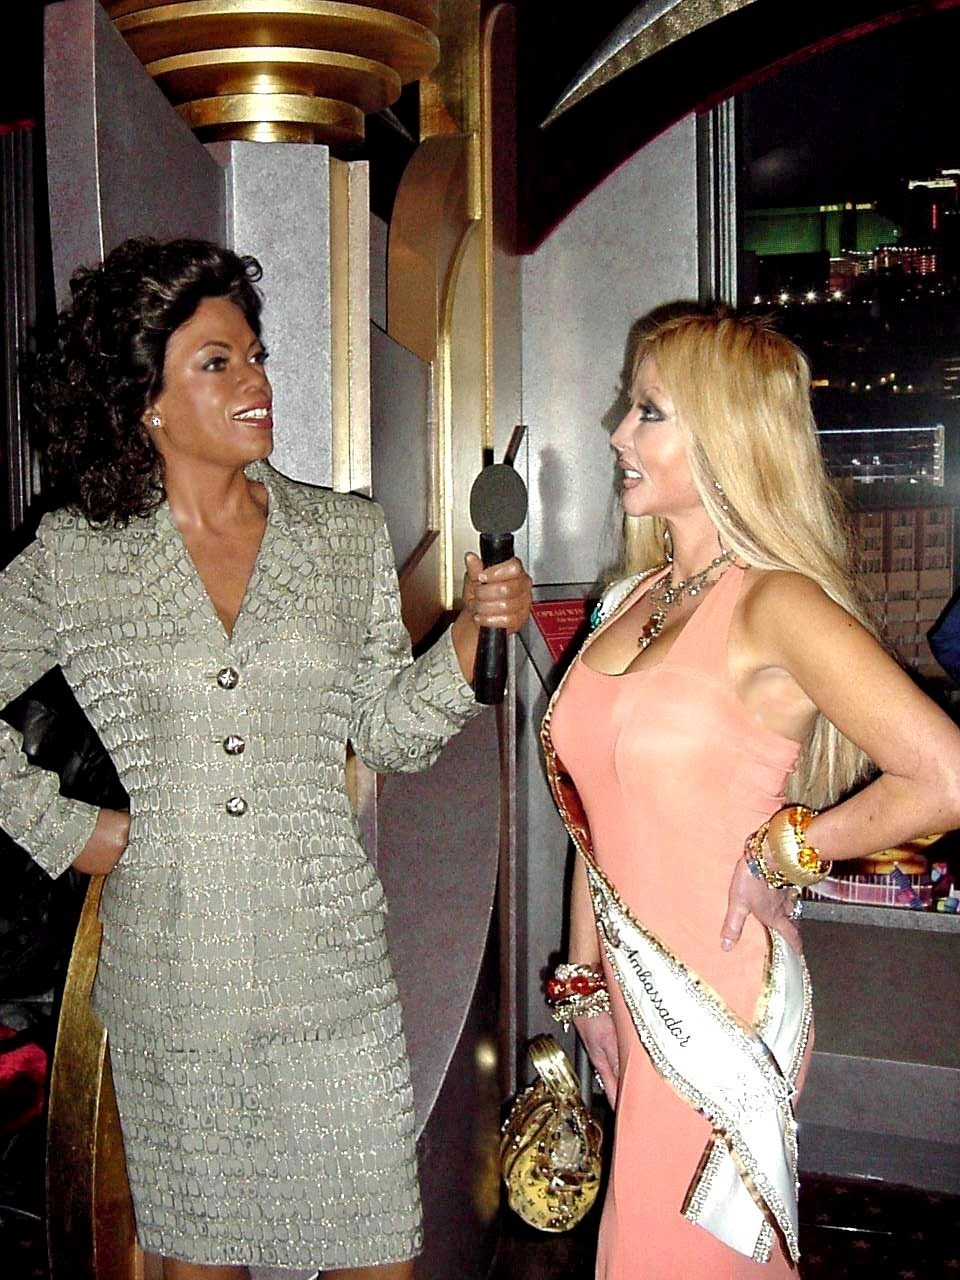 http://ww1.prweb.com/prfiles/2008/01/31/361714/Oprah.jpg